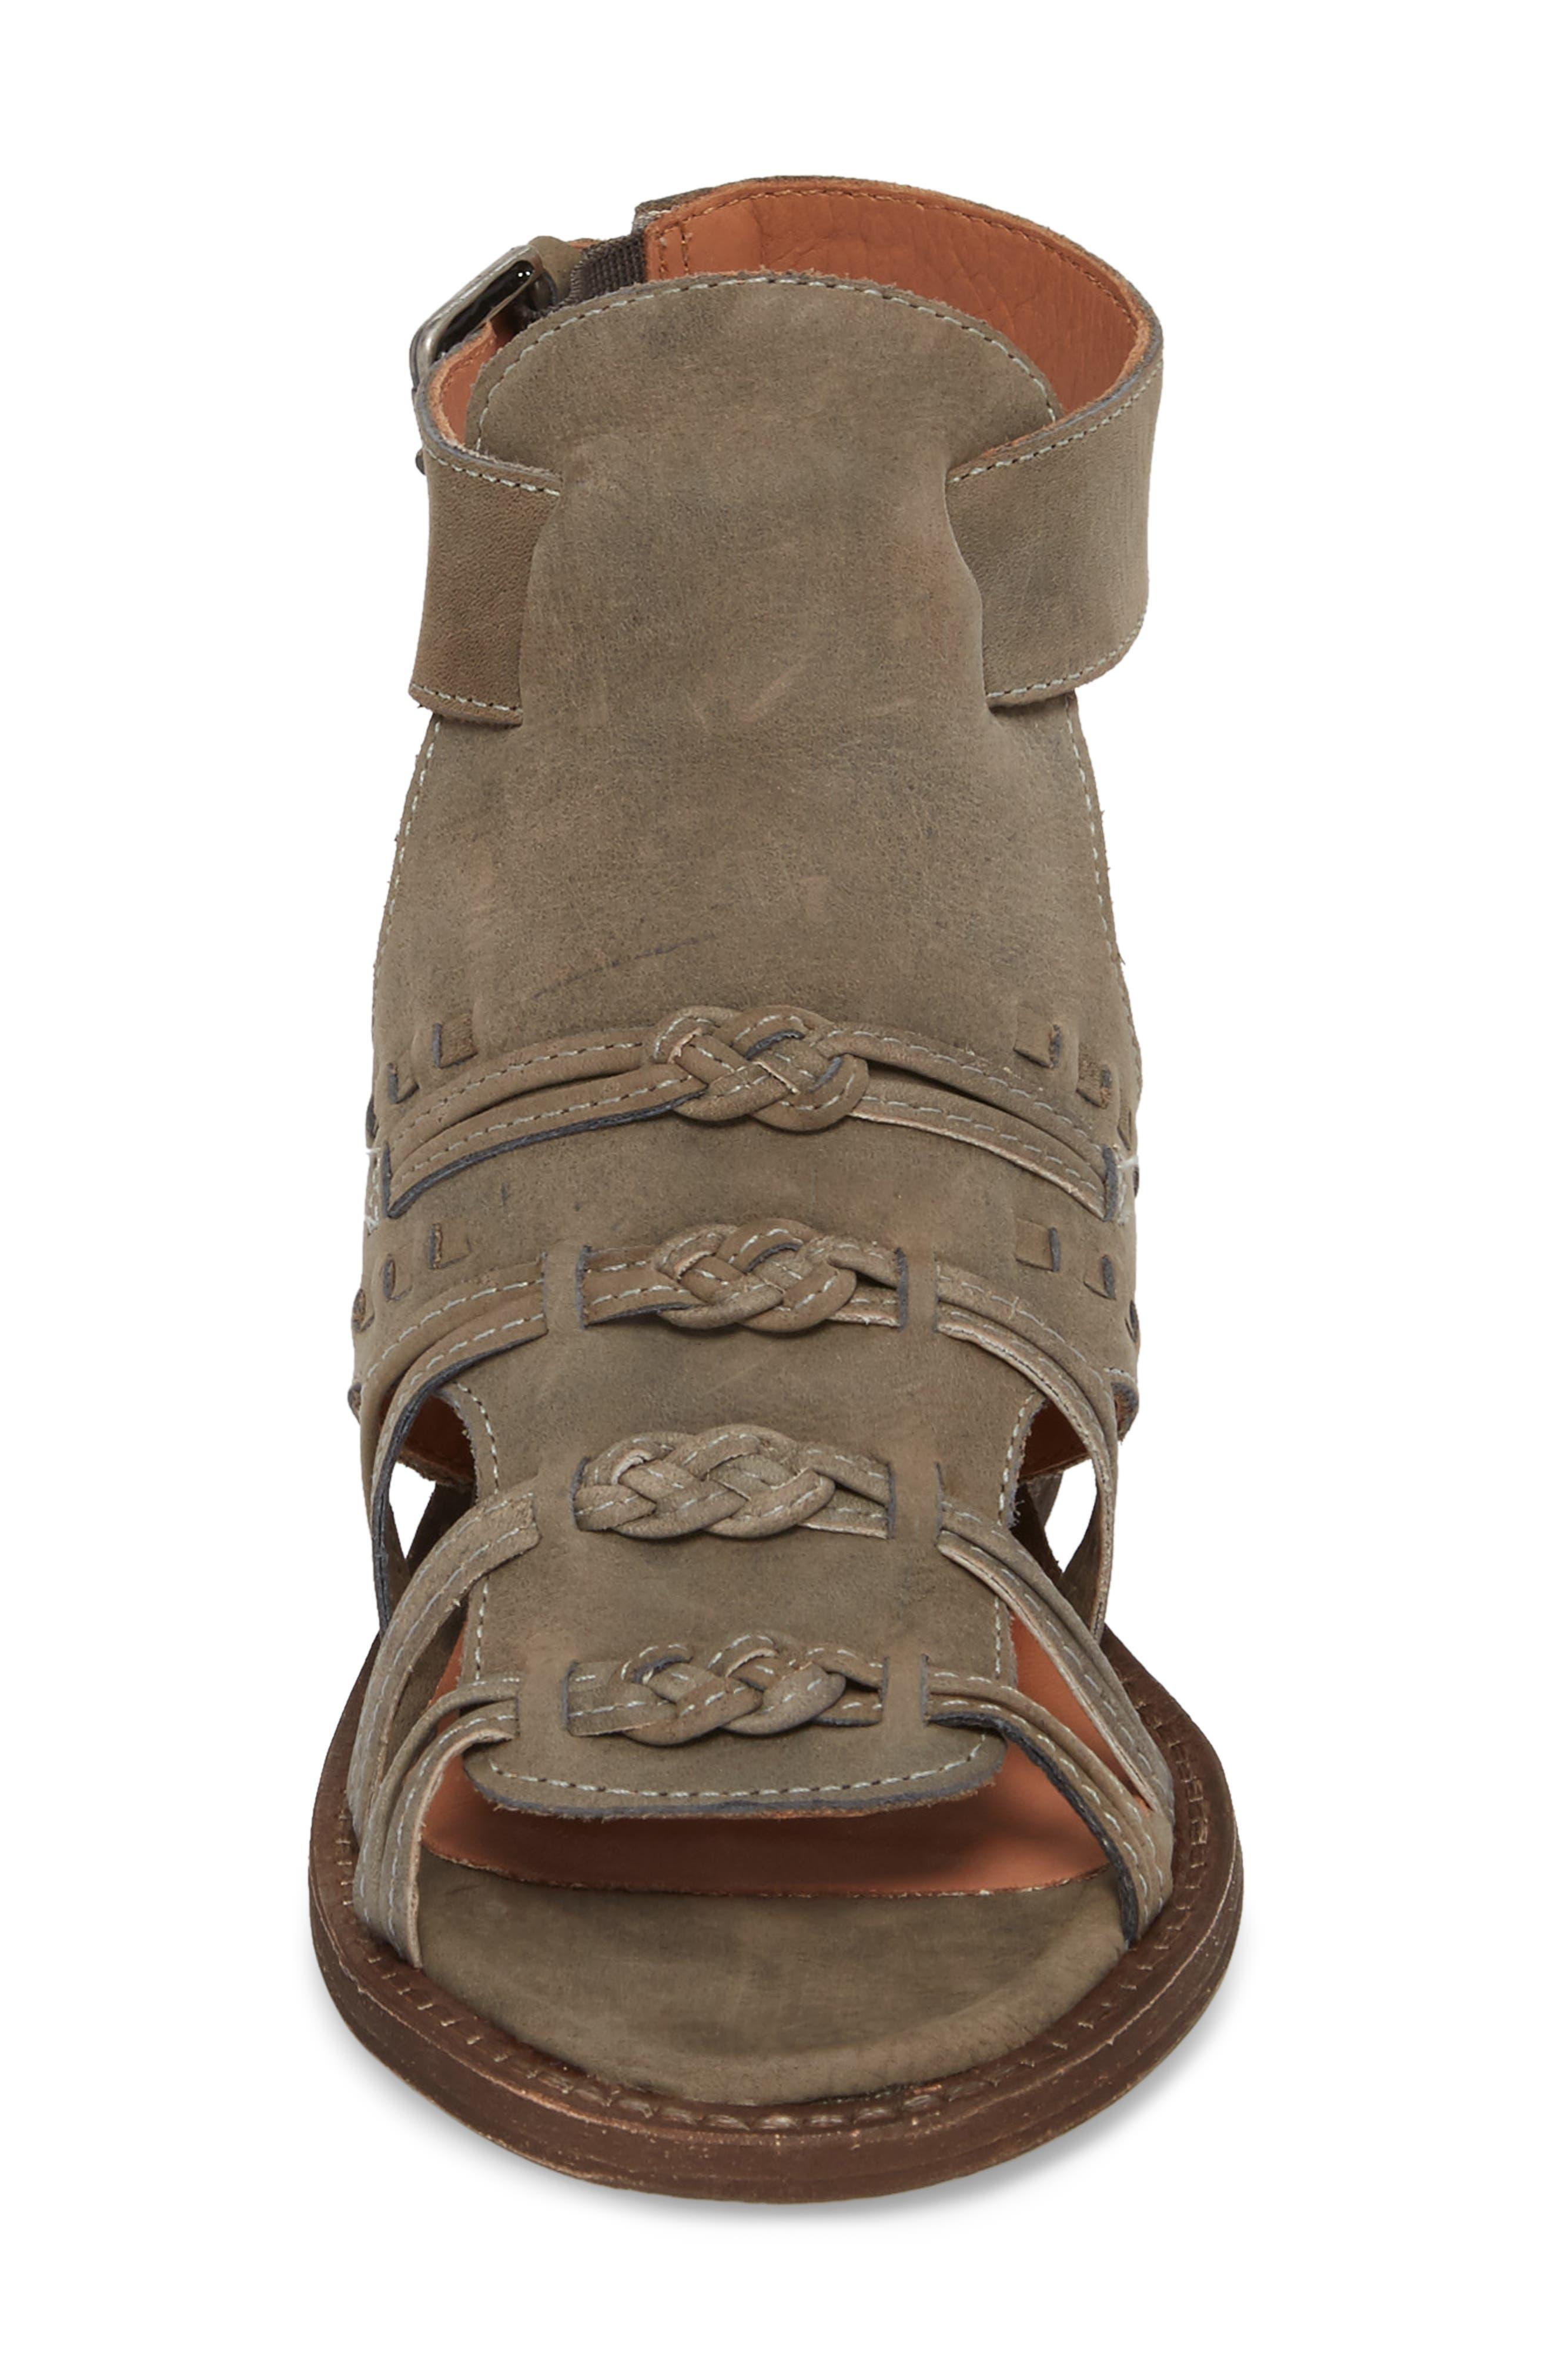 Volcano Sandal,                             Alternate thumbnail 4, color,                             Grey Leather